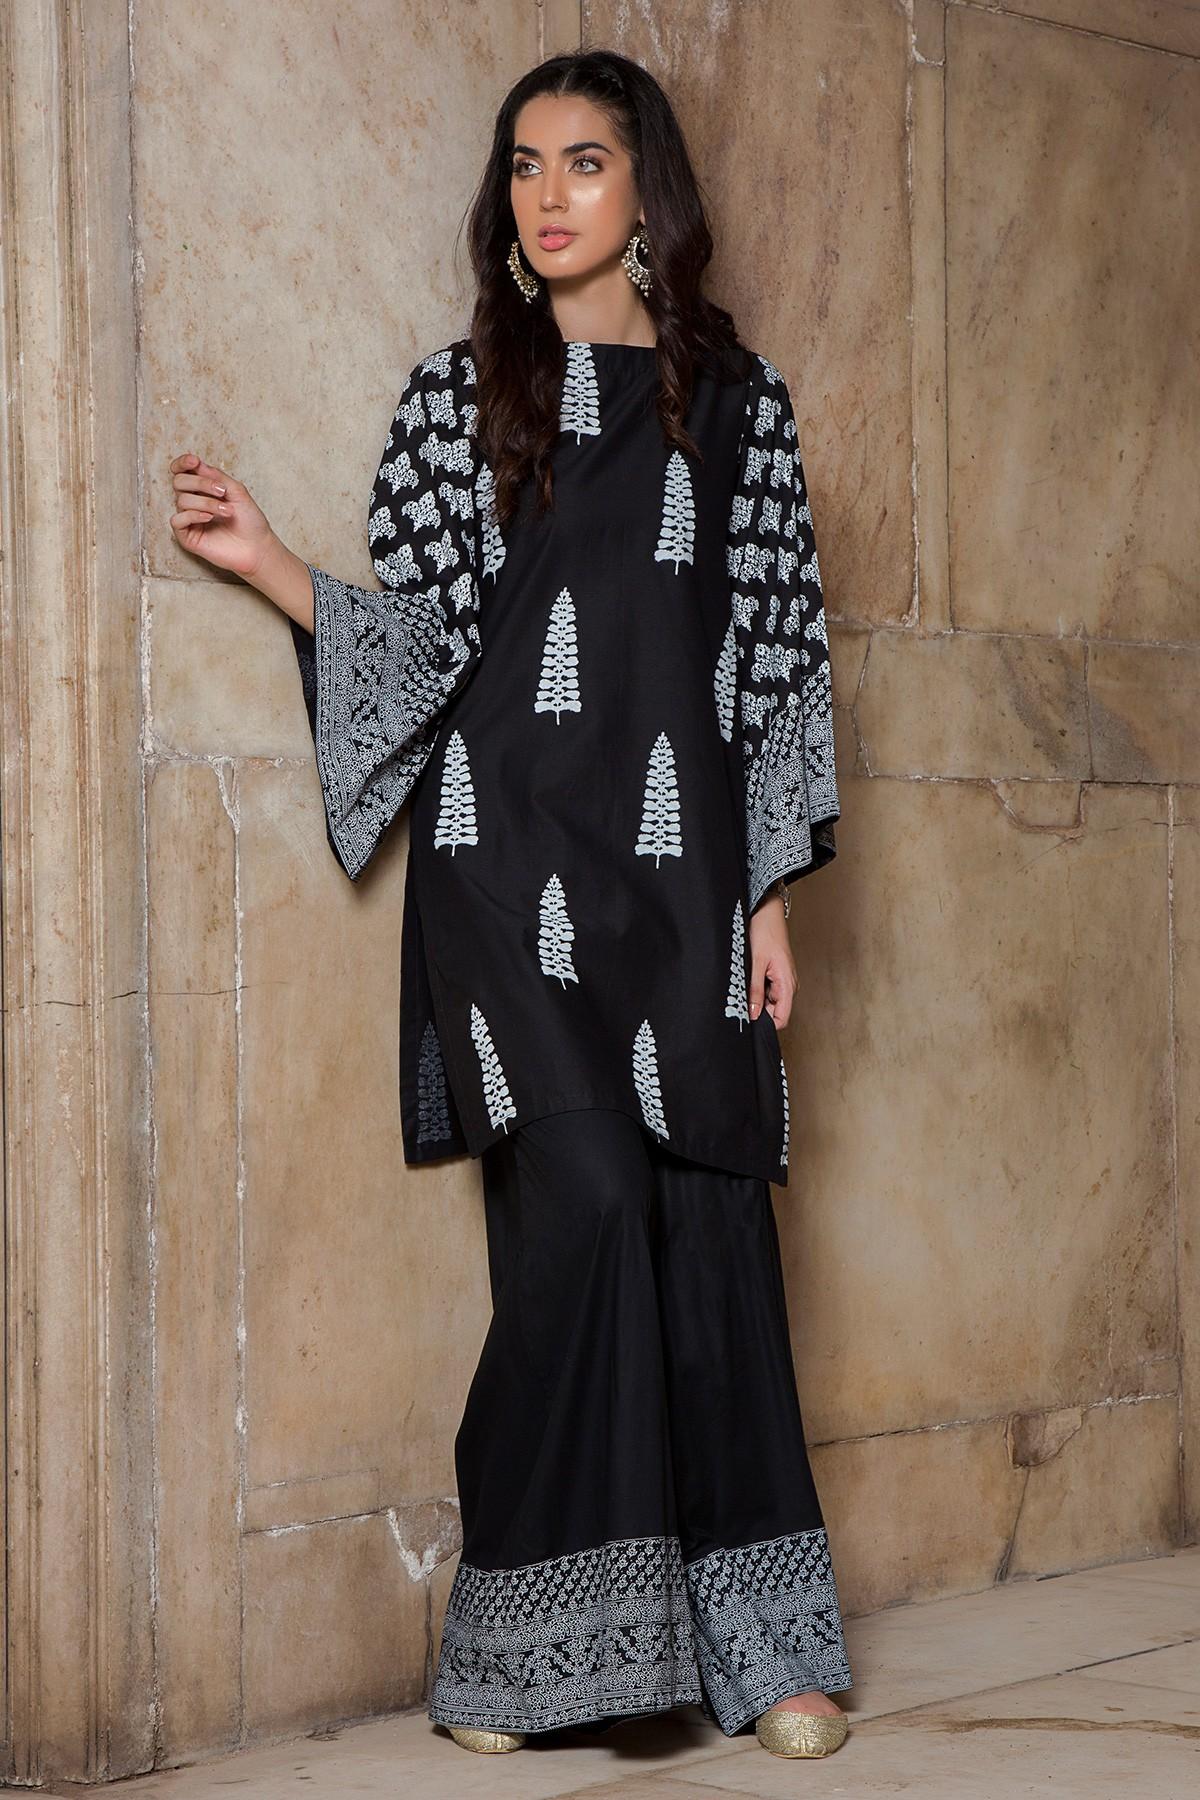 Latest Womens Fashion Clothing Dresses: Origins Latest Ladies Winter Dresses Designs 2019-2020